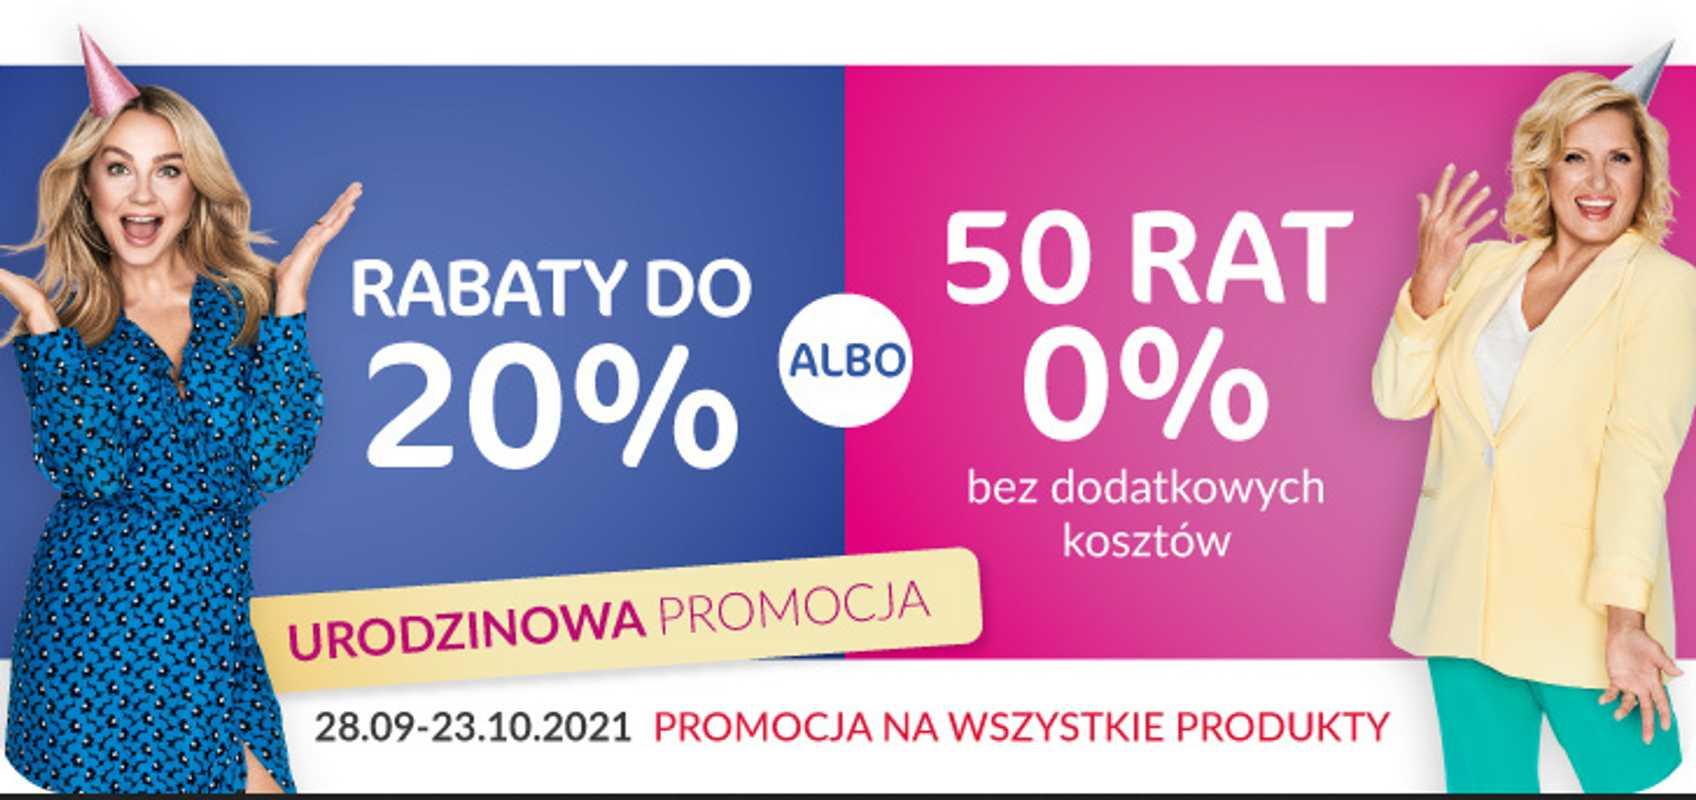 Agata Meble - gazetka promocyjna ważna od 28.09.2021 do 23.10.2021 - strona 1.